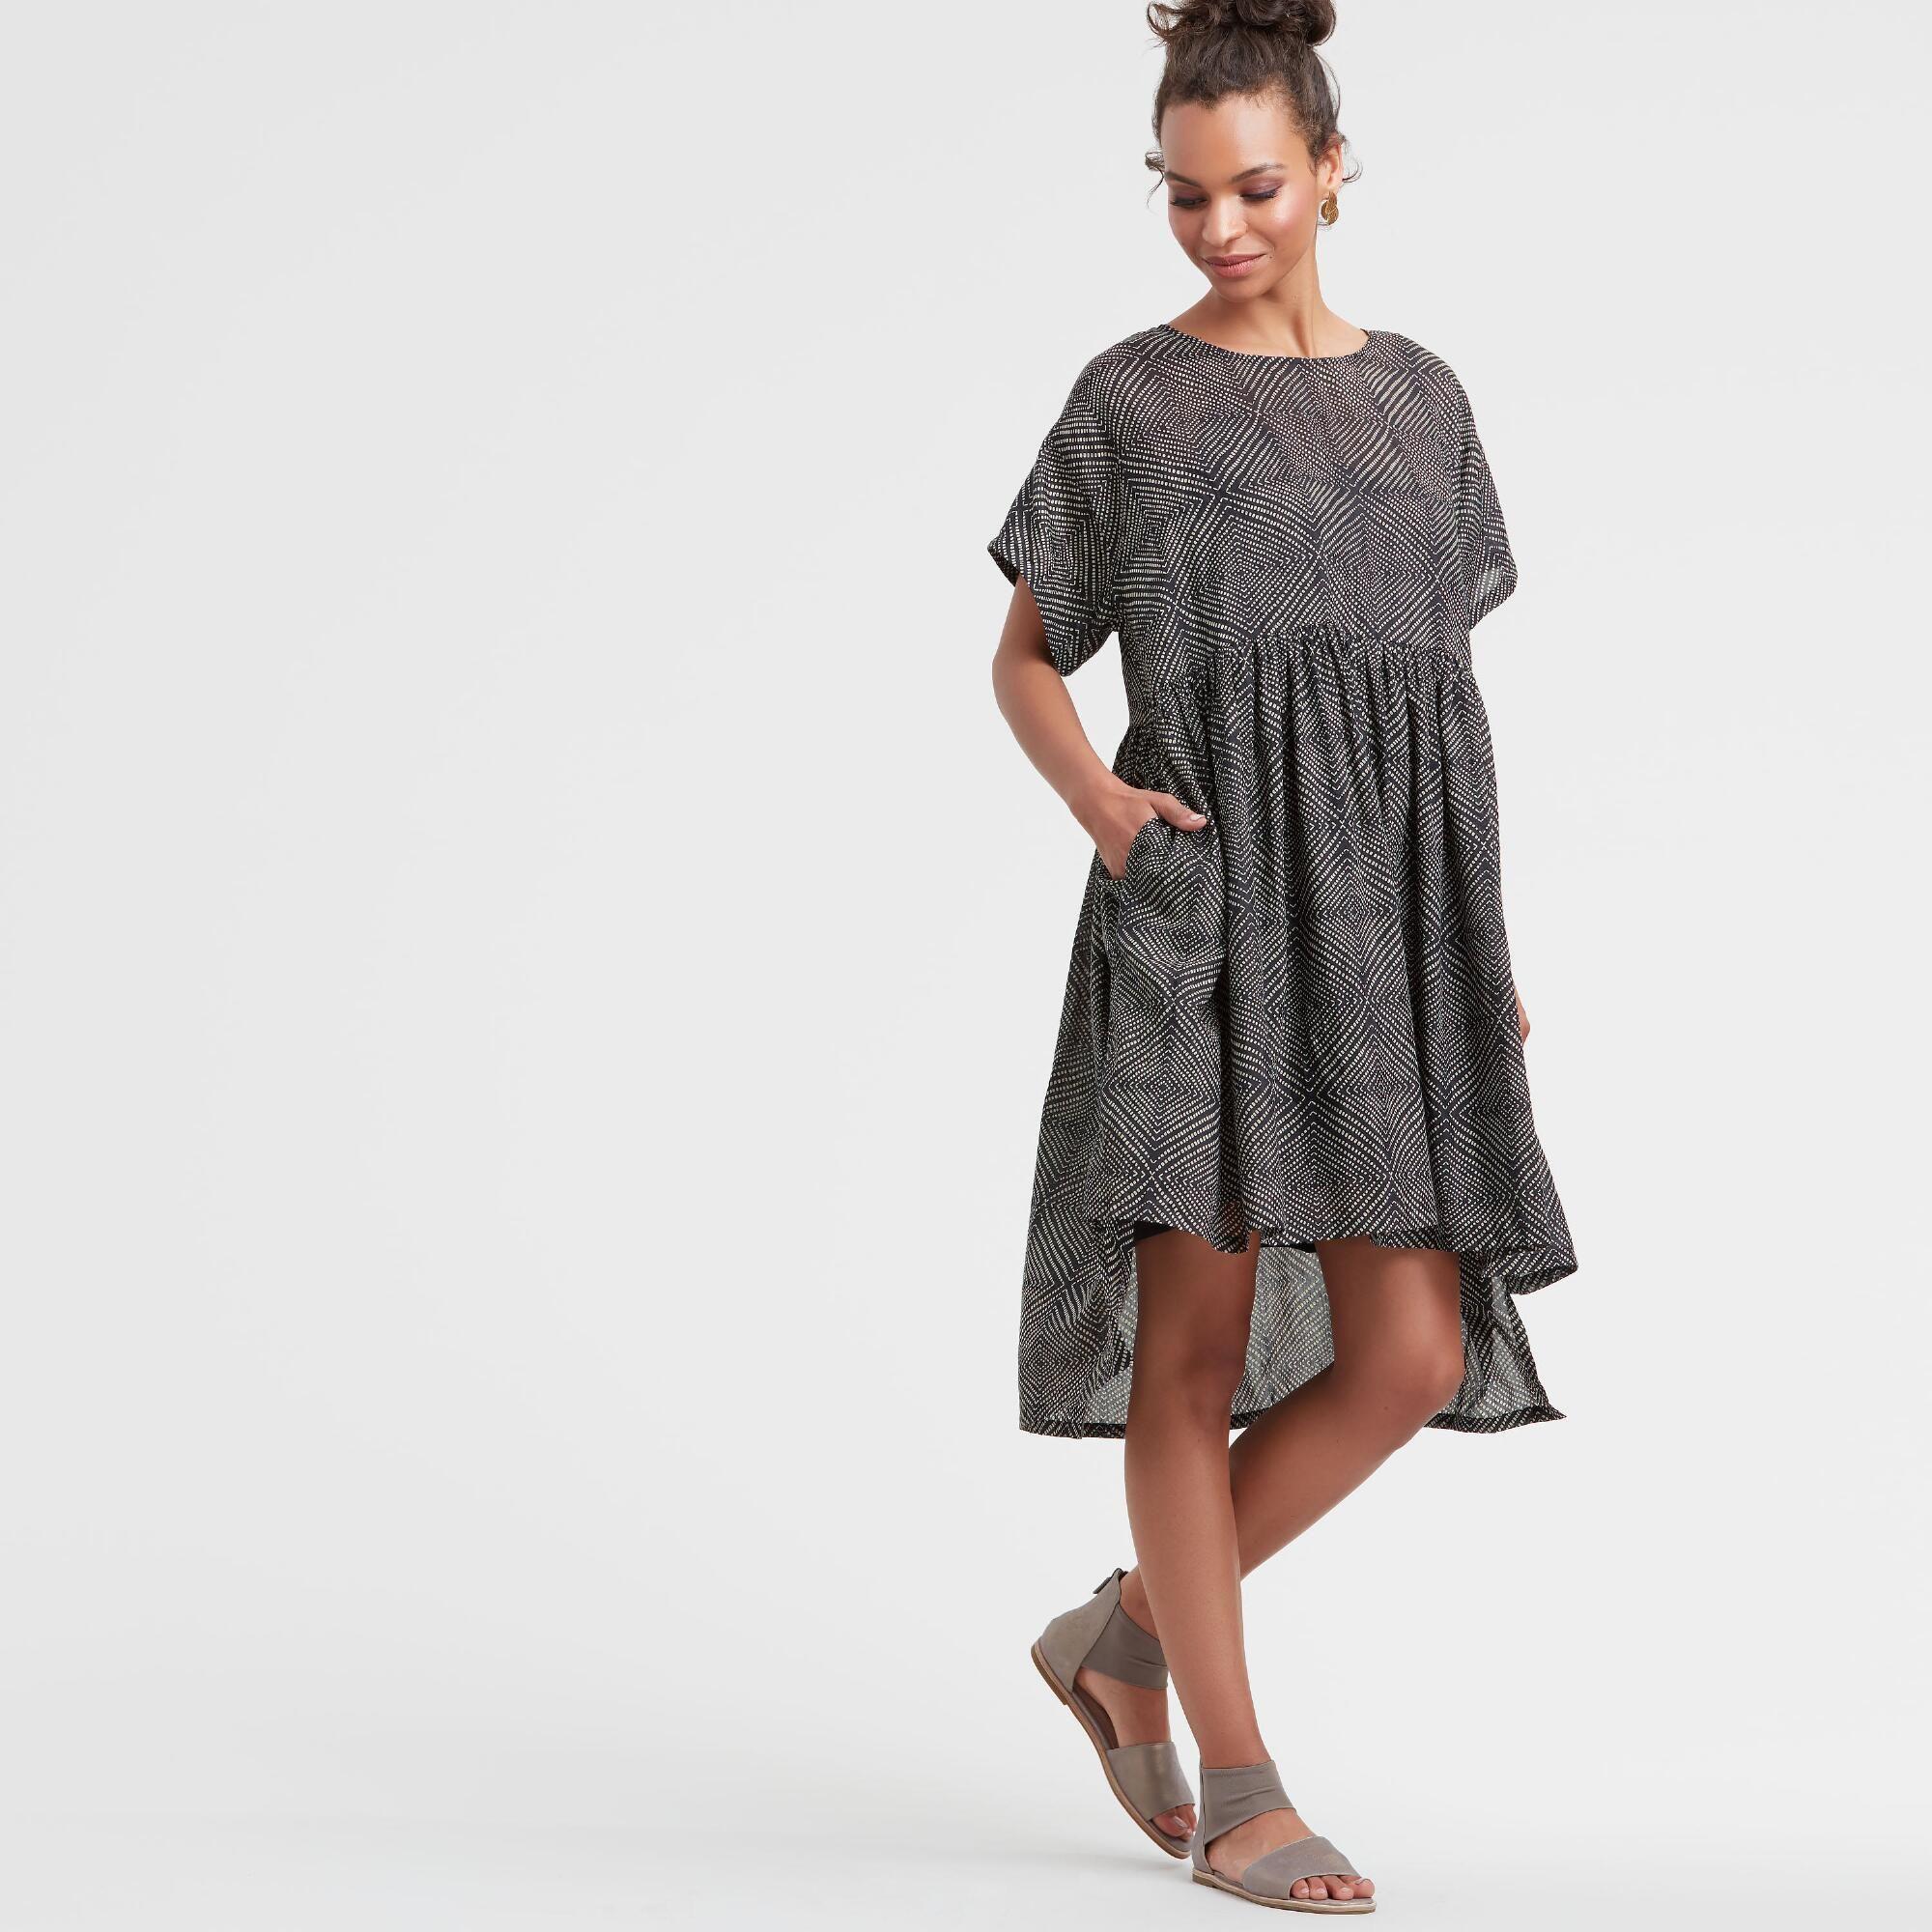 e1eabe18598 Black and White Simone Dress - Smmd by World Market